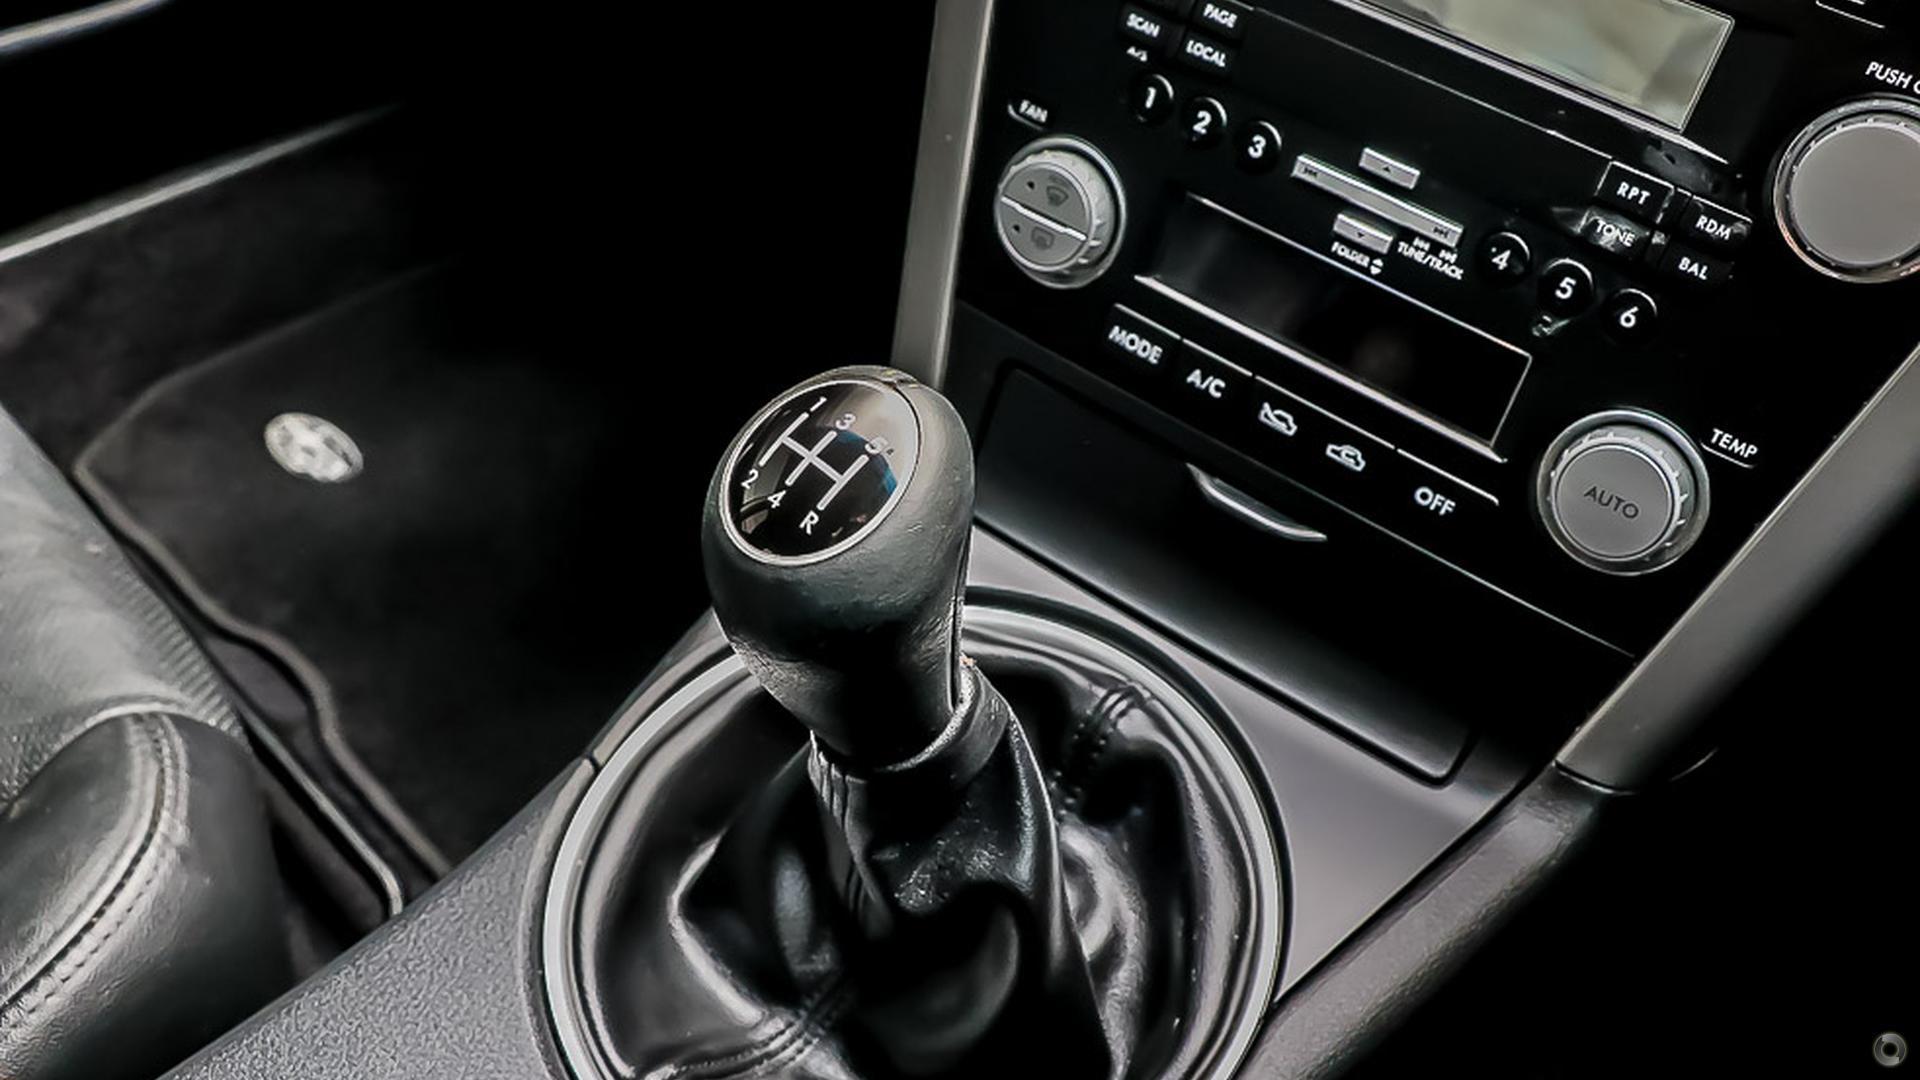 2009 Subaru Liberty Sport Edition 4GEN